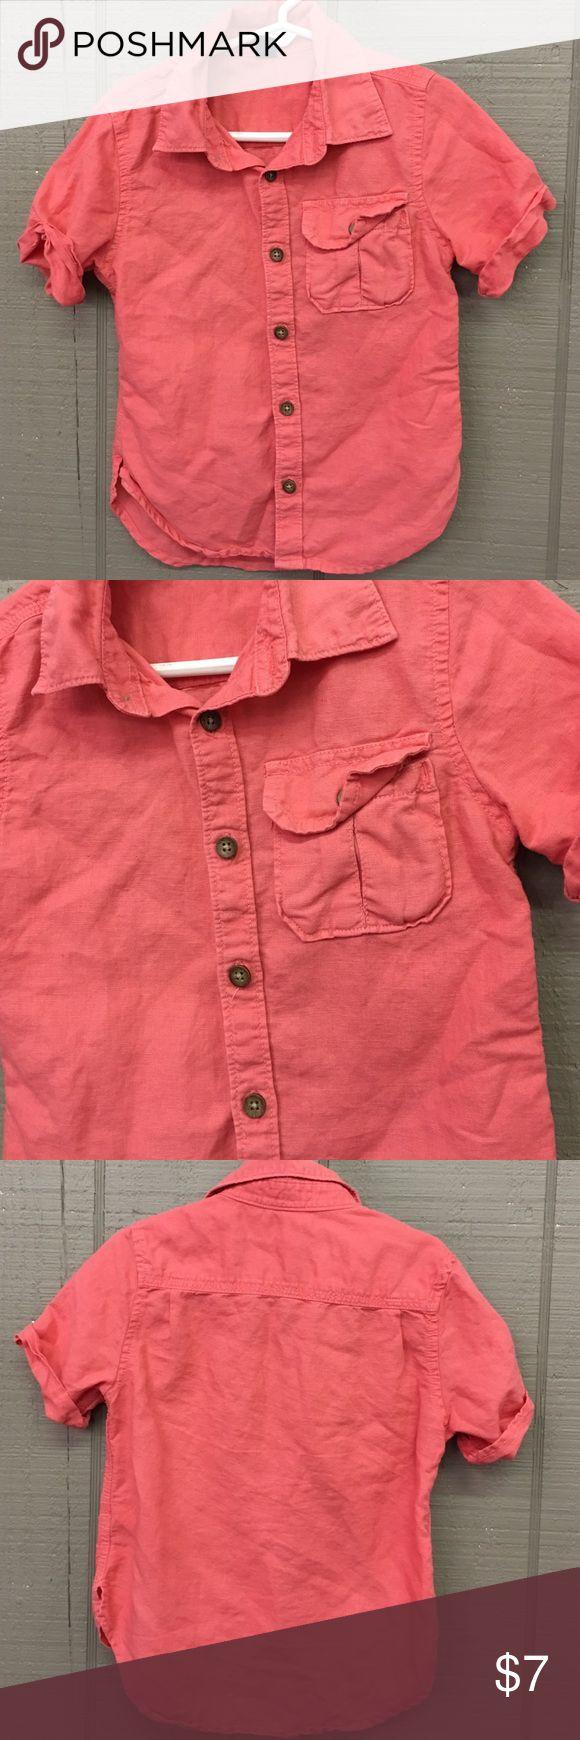 45%linen, 55 cotton coral shirt 45%linen, 55 cotton coral shirt GAP Shirts & Tops Button Down Shirts